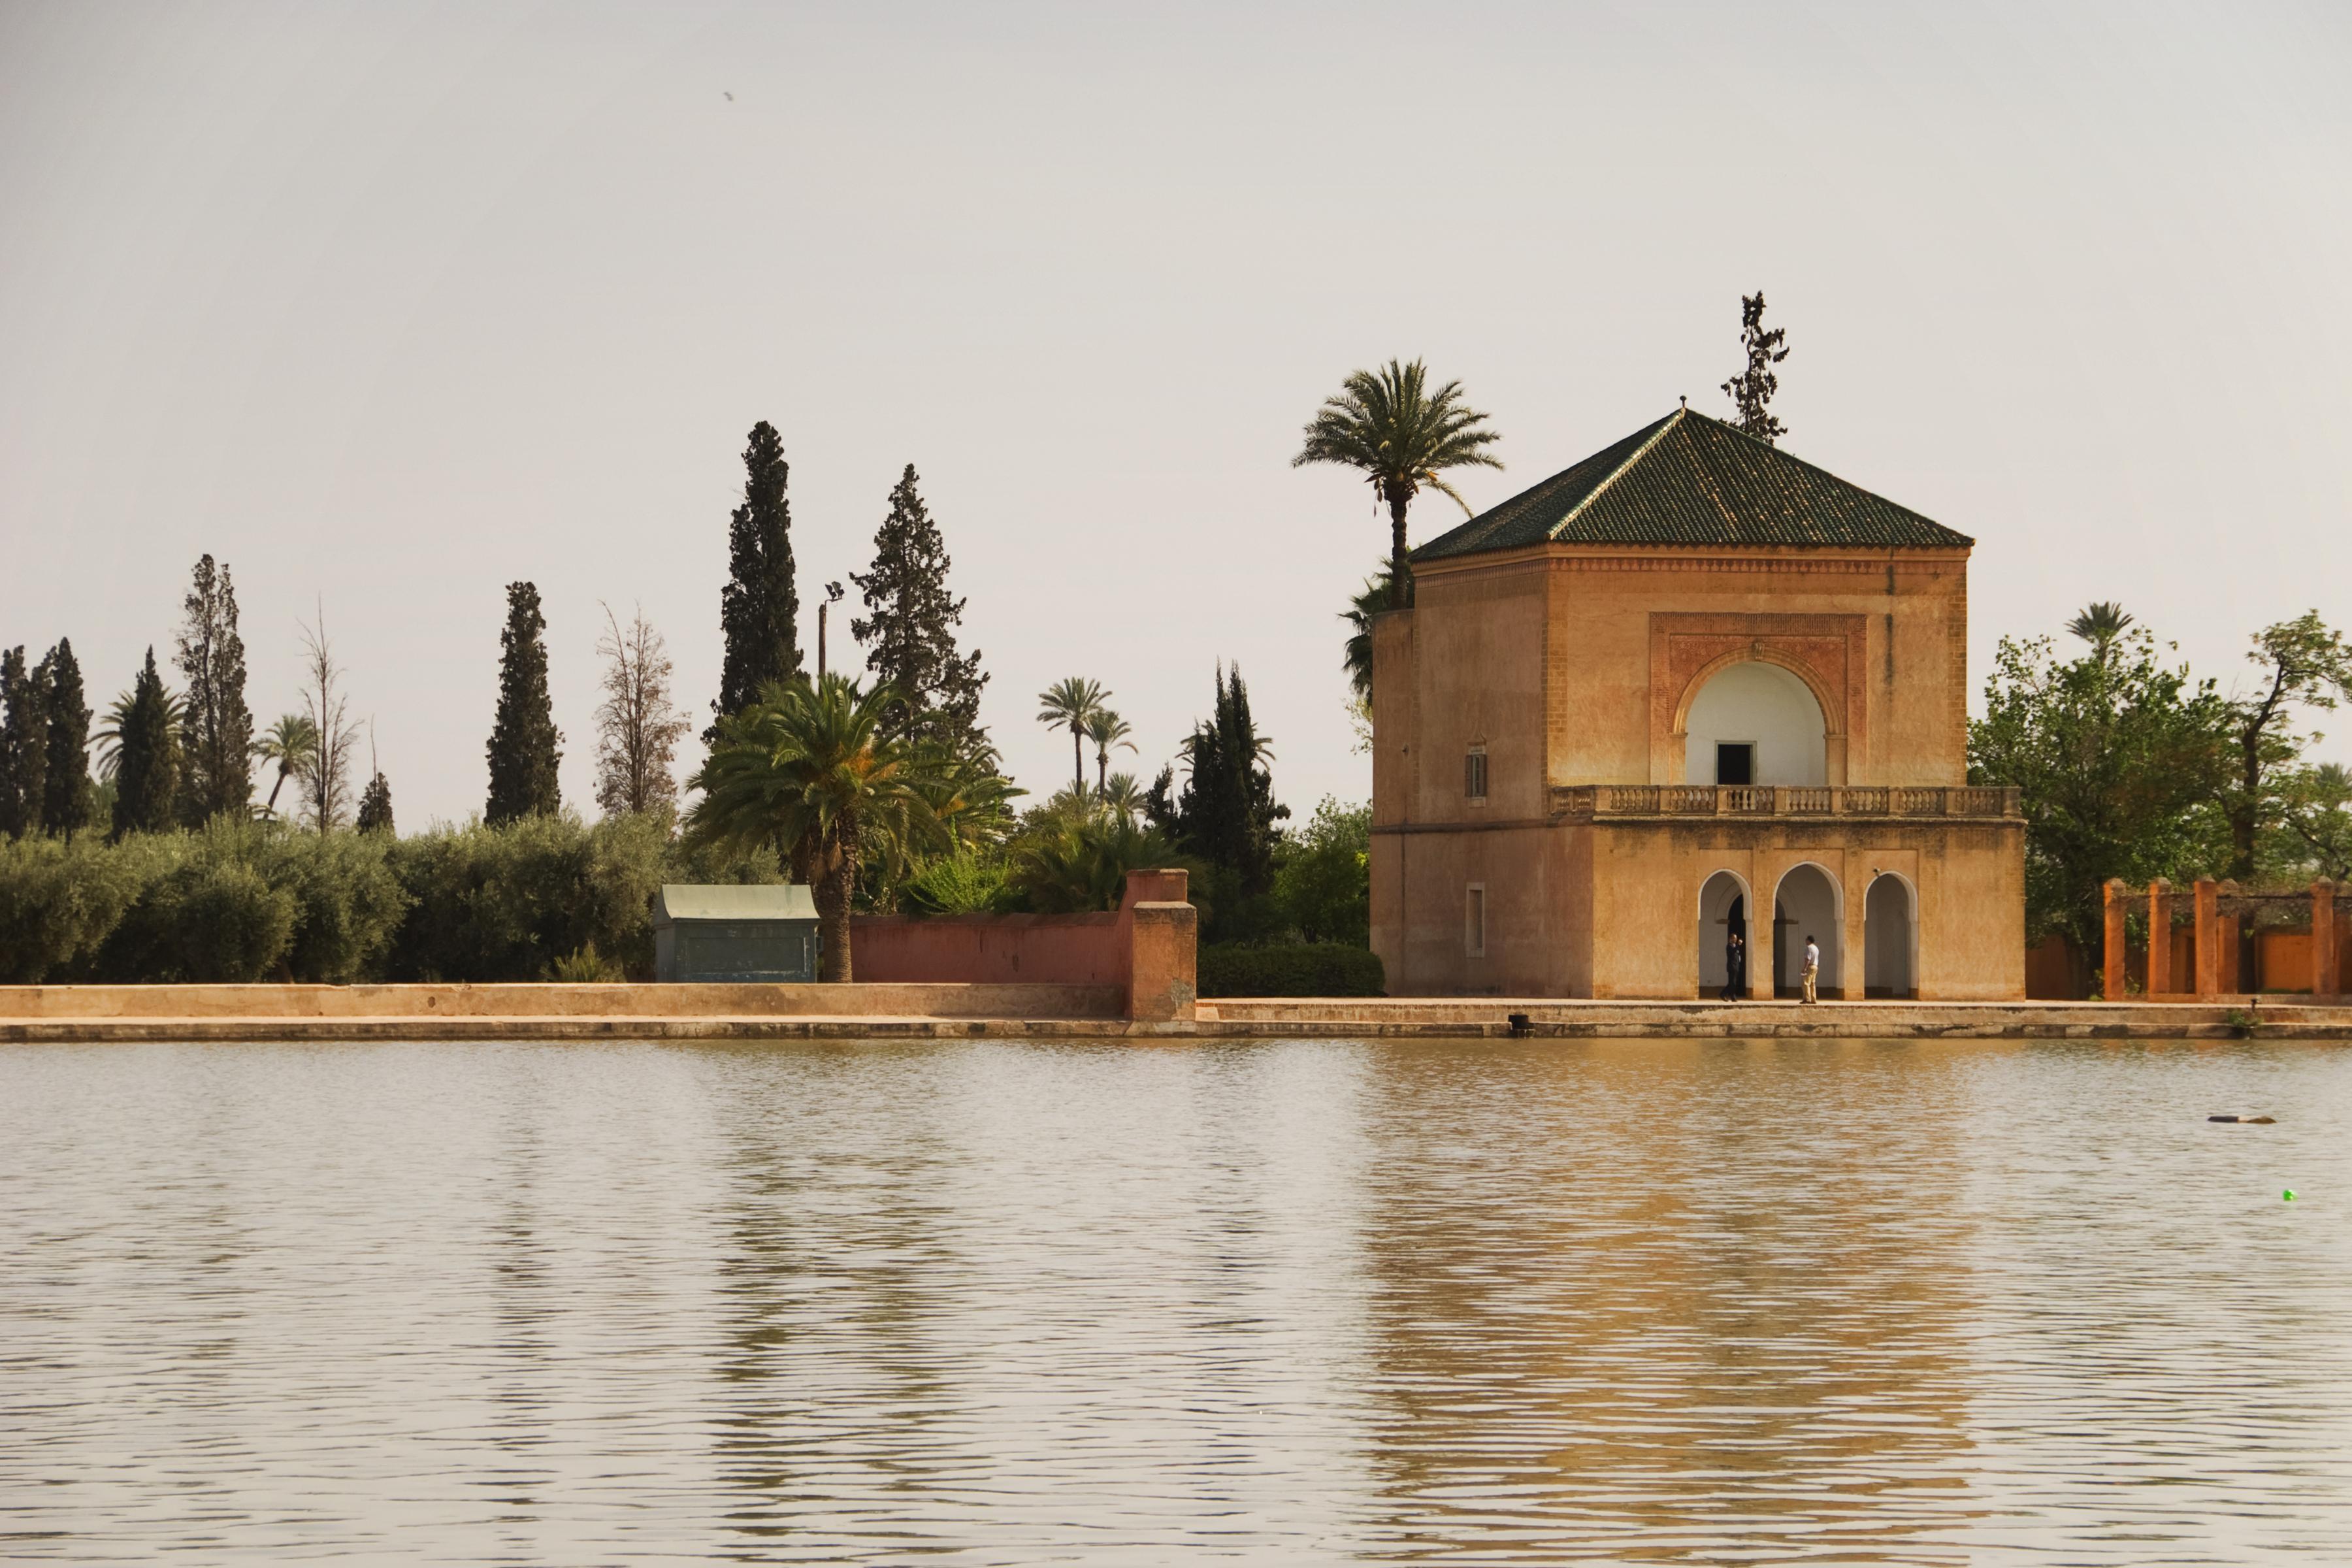 File:Menara Gardens (2357045101).jpg - Wikimedia Commons